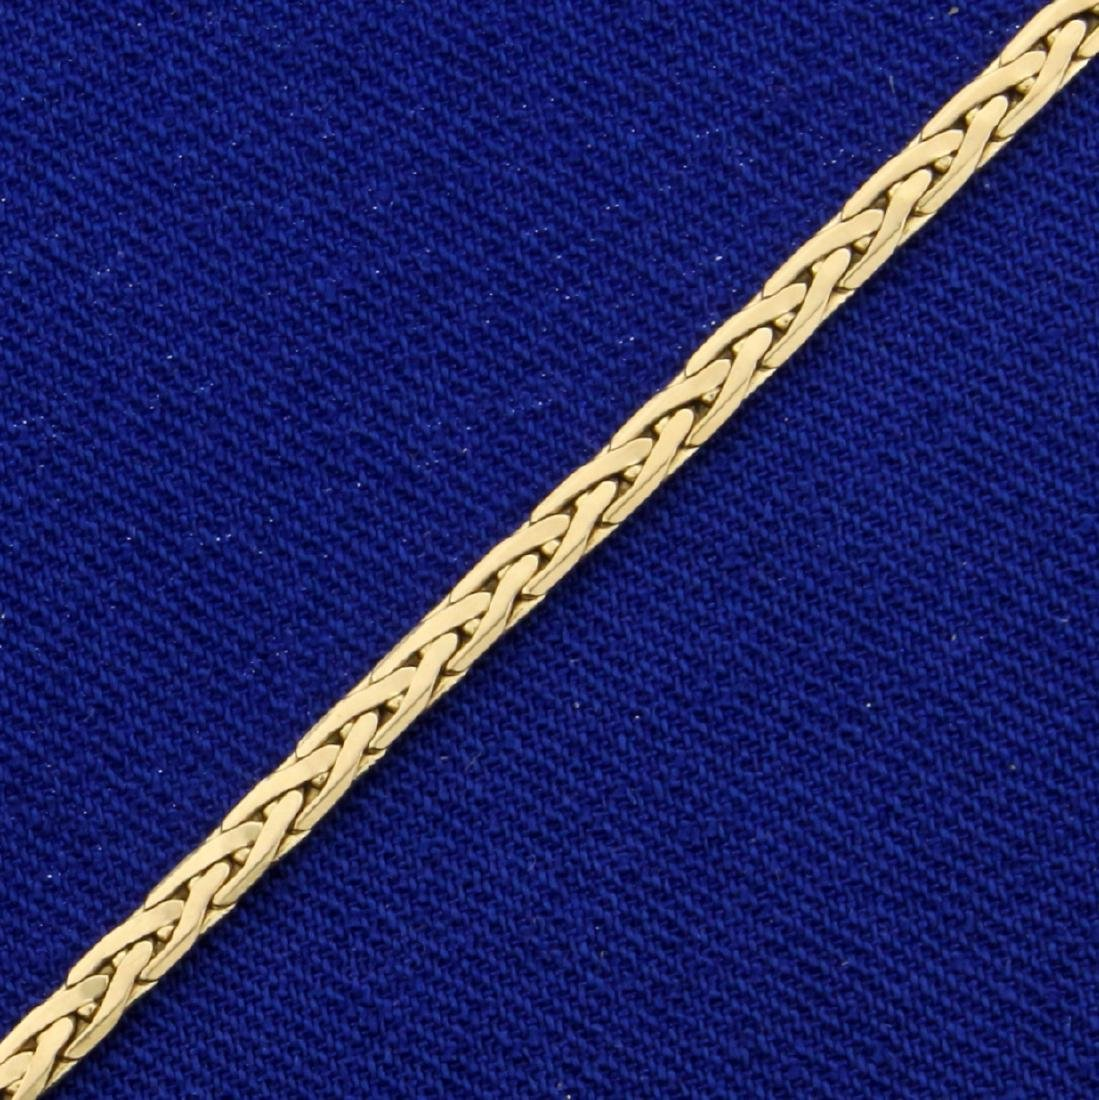 Woven Link Bracelet in 14K Yellow Gold - 2